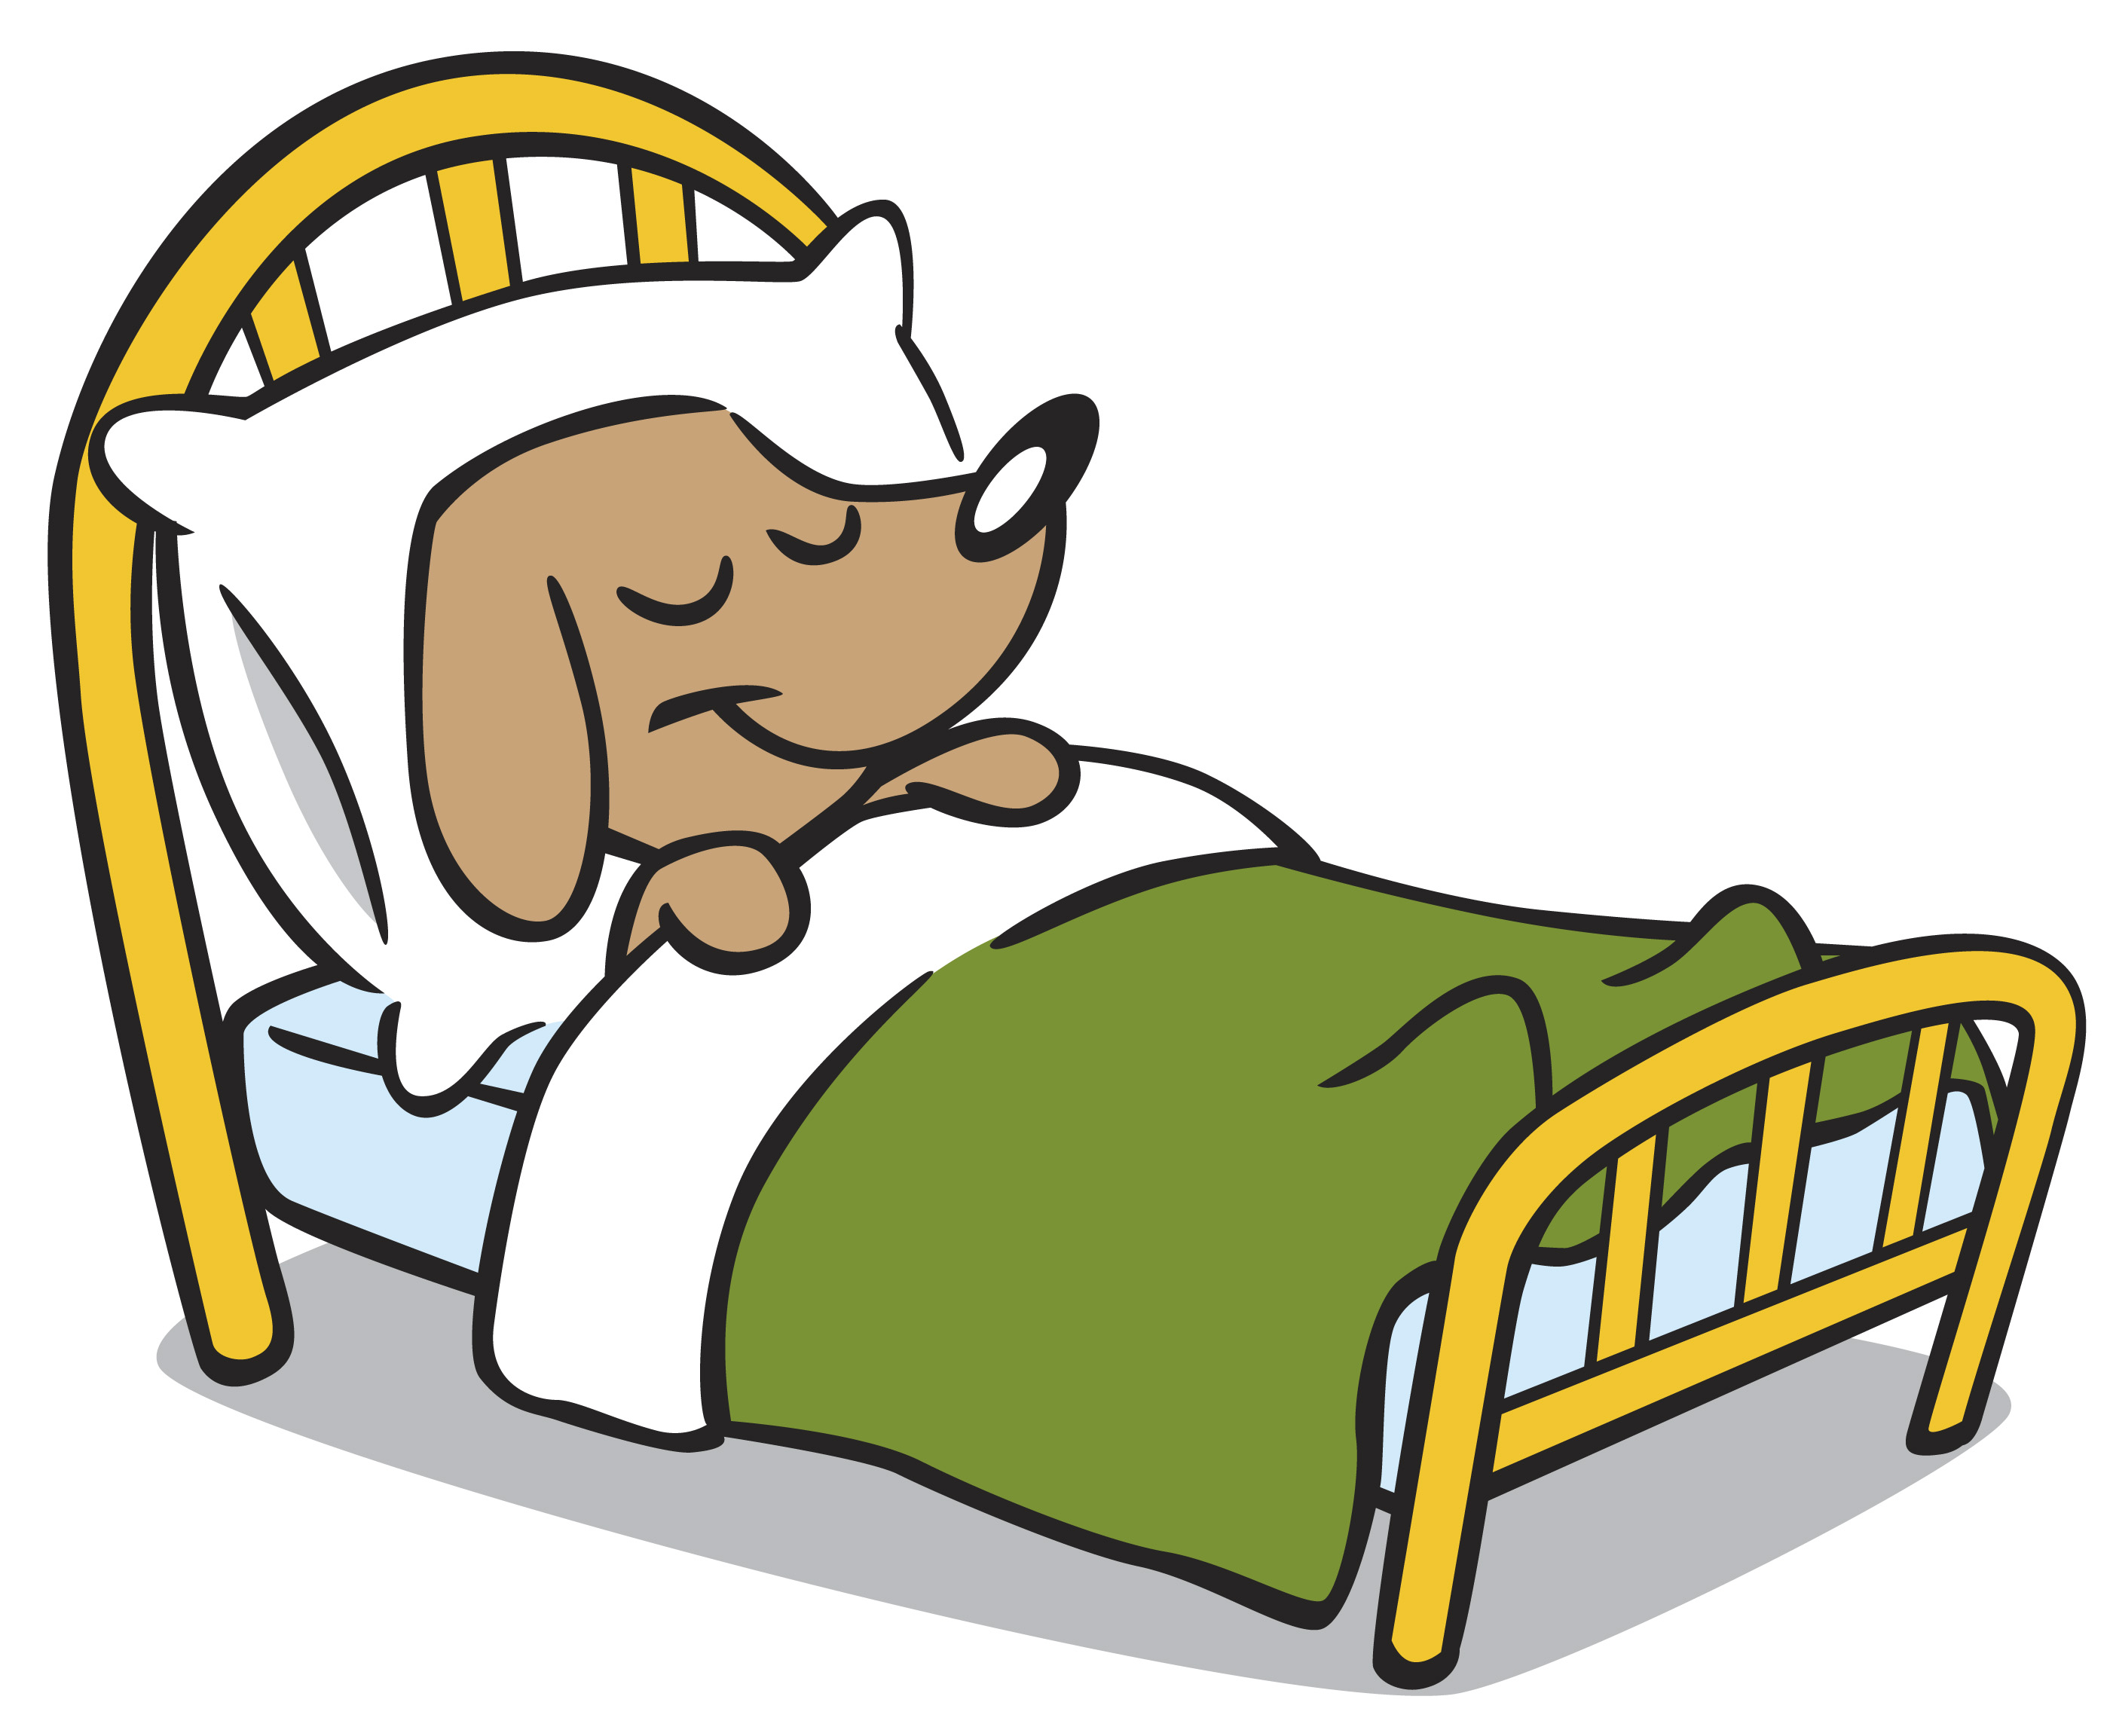 2800x2304 Clip Art Dog Bed Clipart Clipart Kid